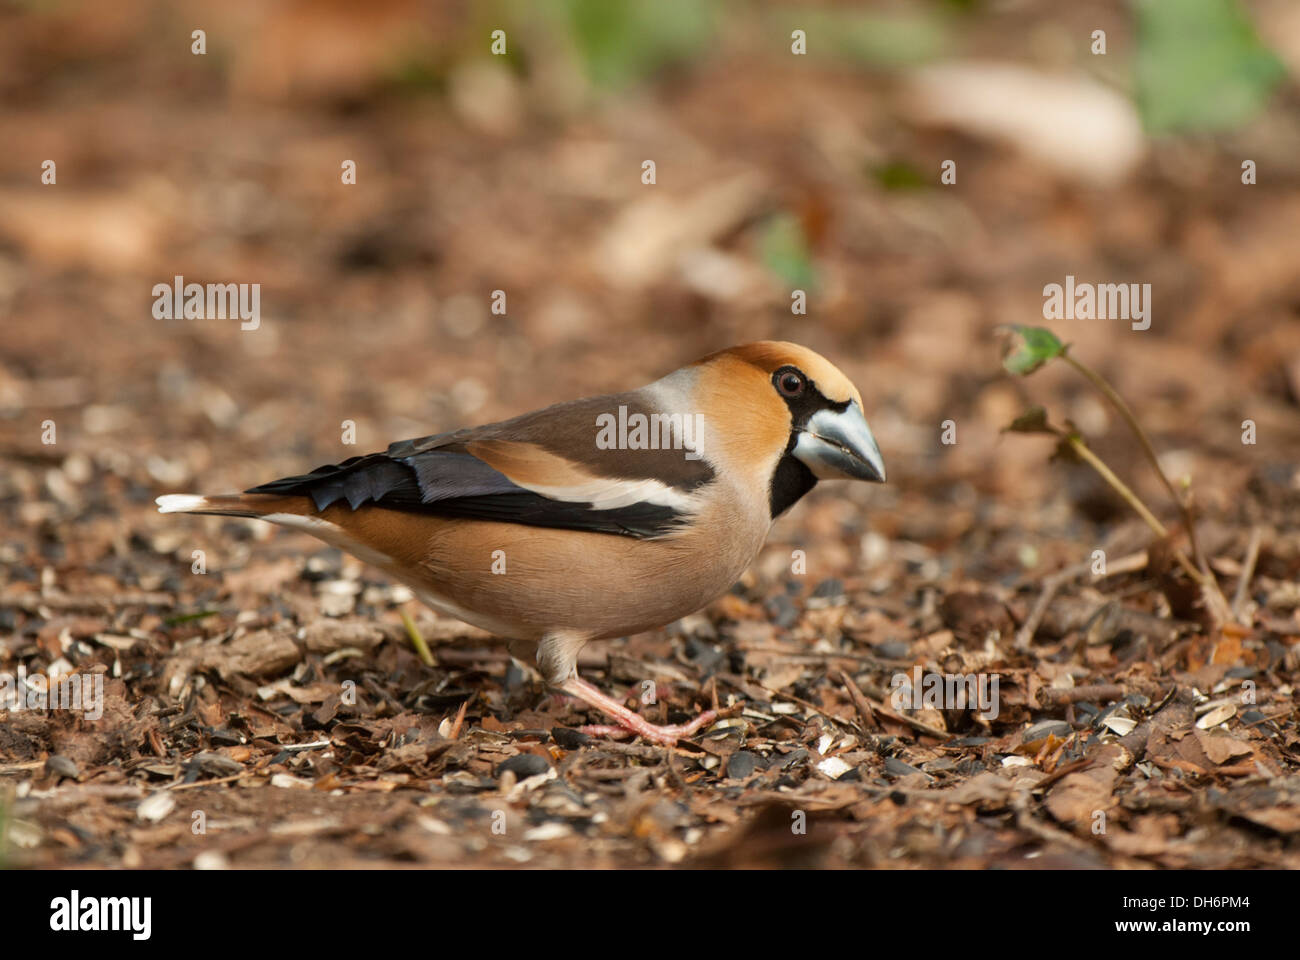 Adult Male feeding on seeds on ground. - Stock Image